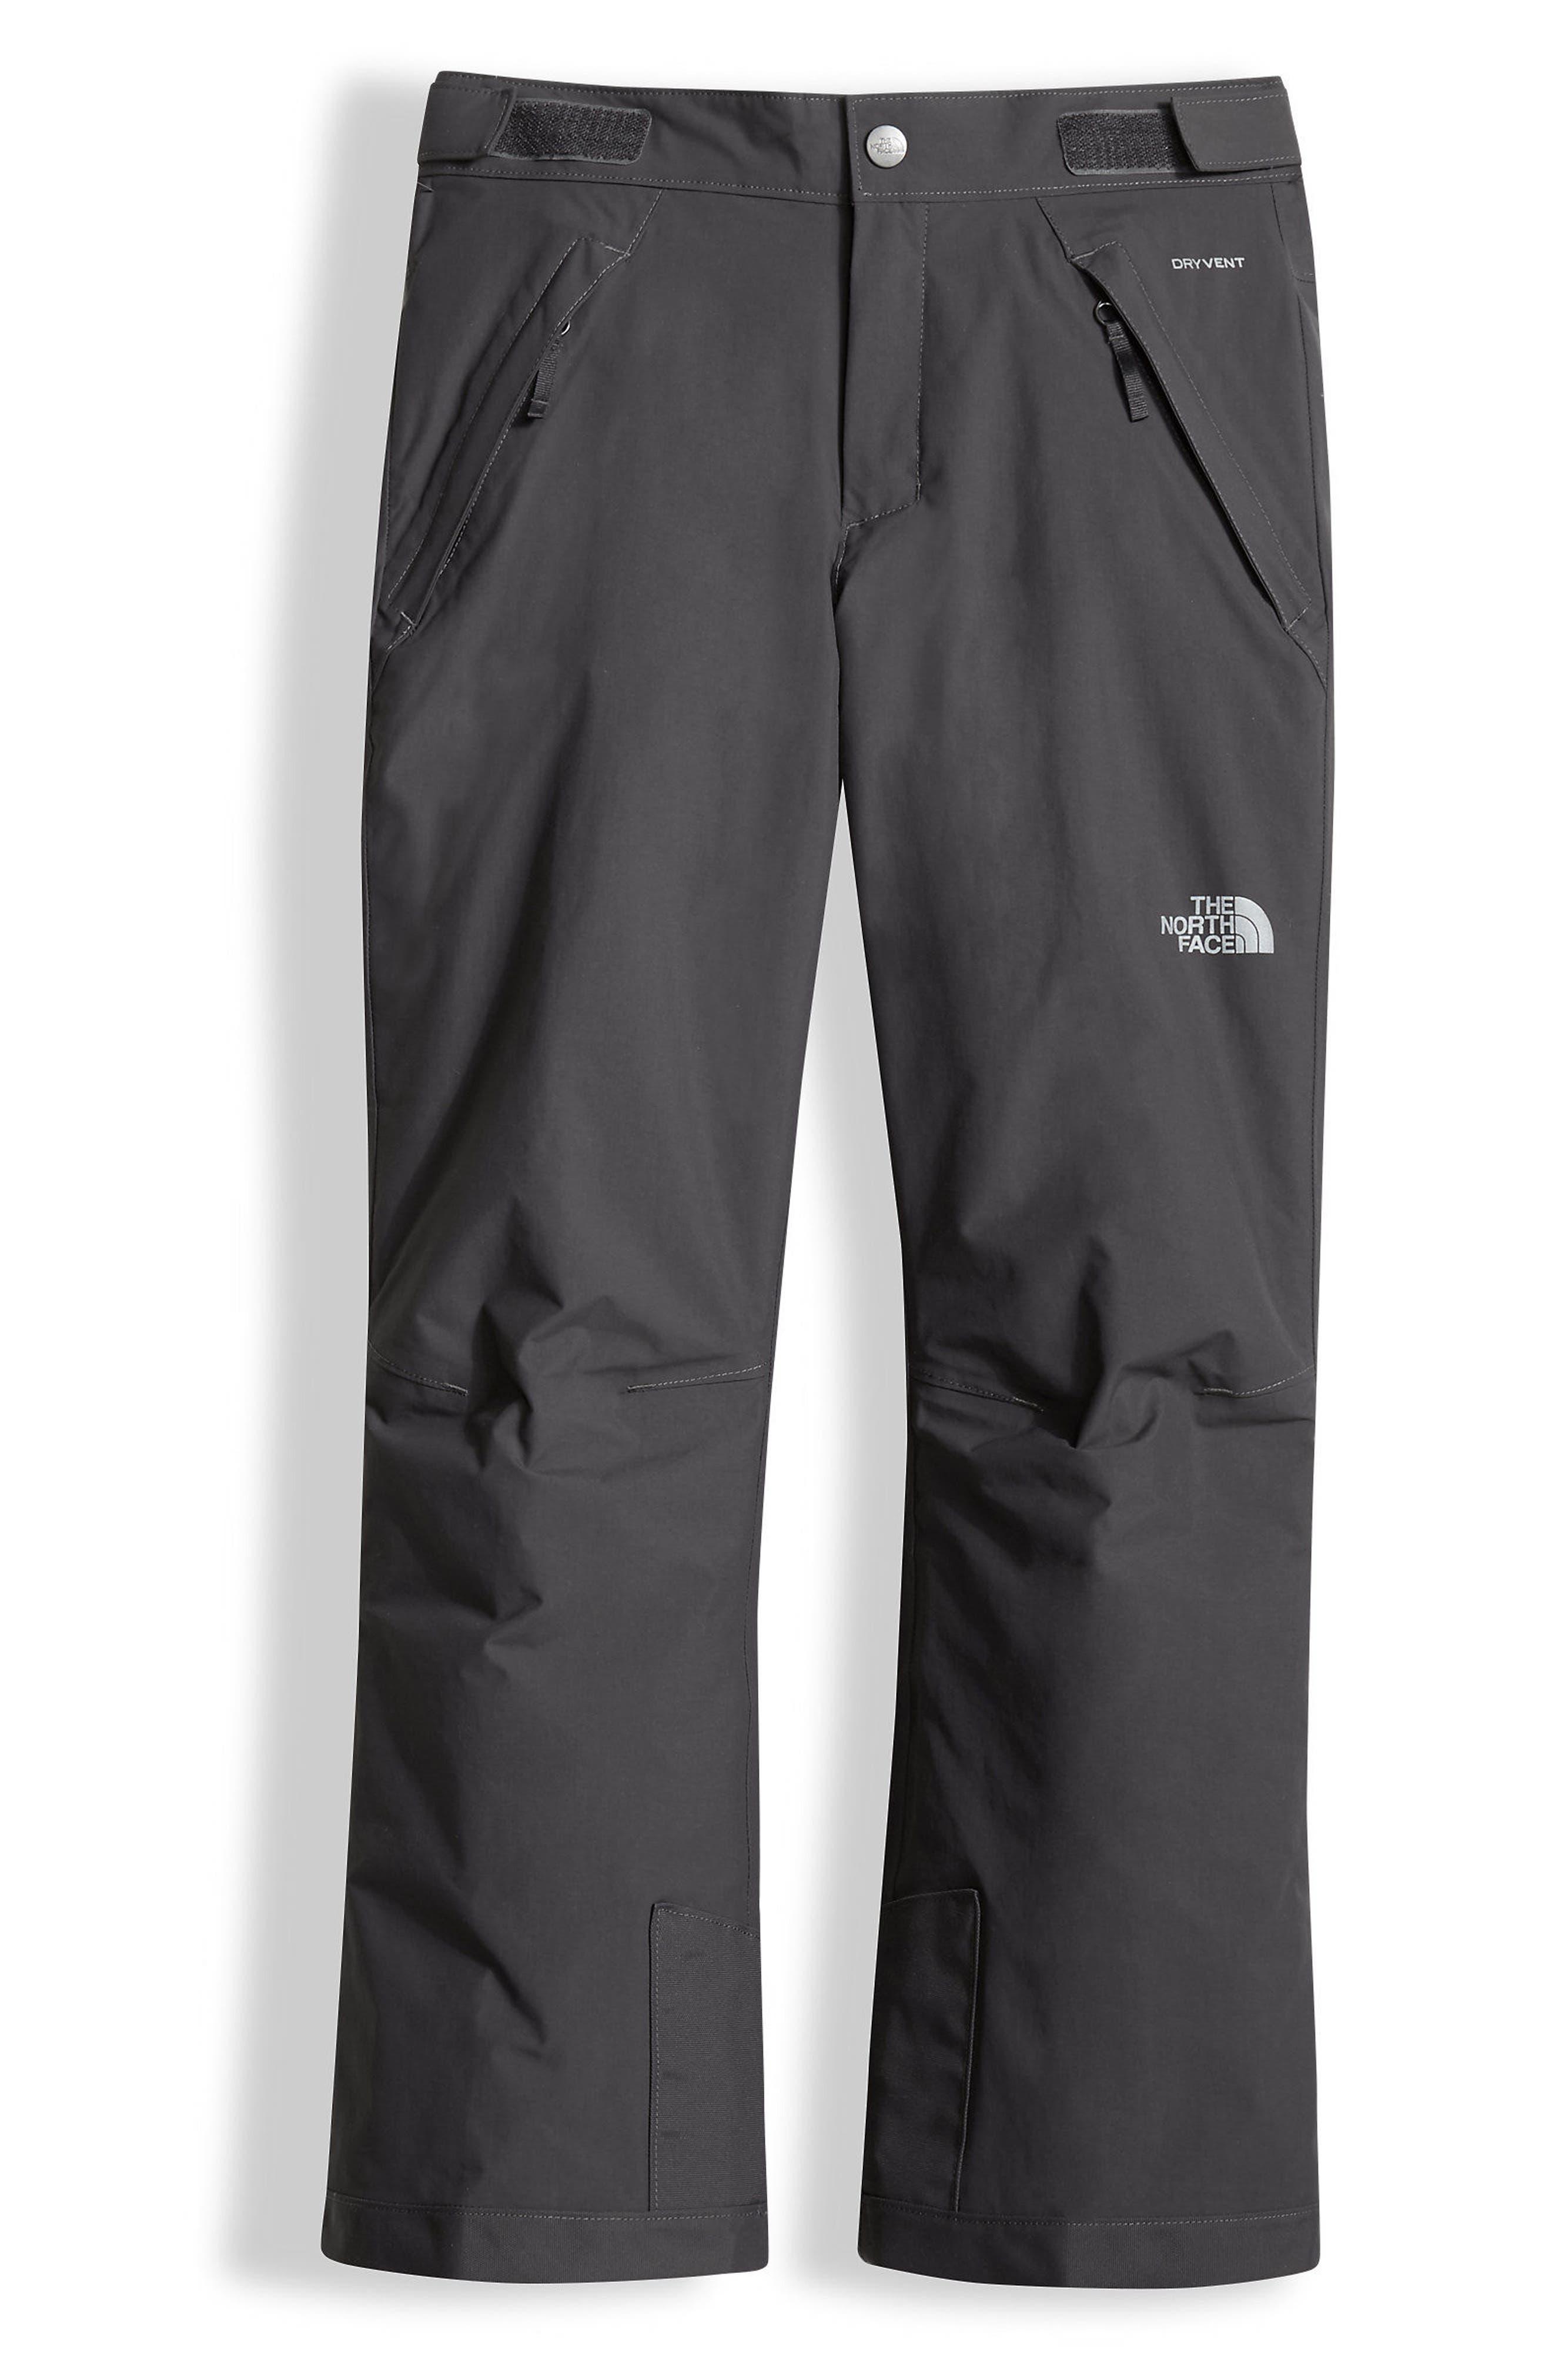 Freedom Waterproof Heatseeker<sup>™</sup> Insulated Snow Pants,                         Main,                         color, Graphite Grey